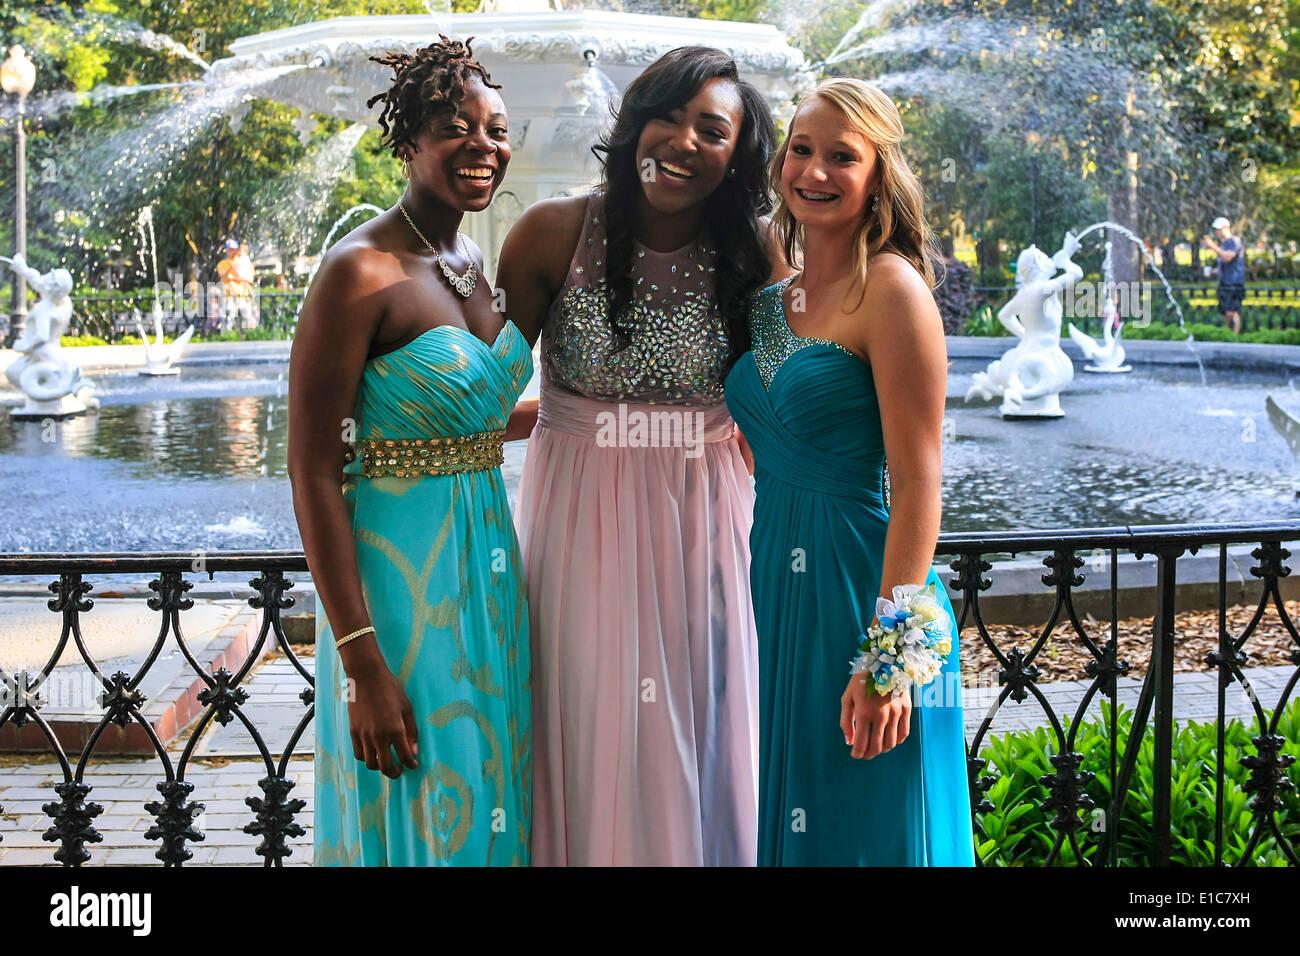 High School Prom Night Stockfotos & High School Prom Night Bilder ...